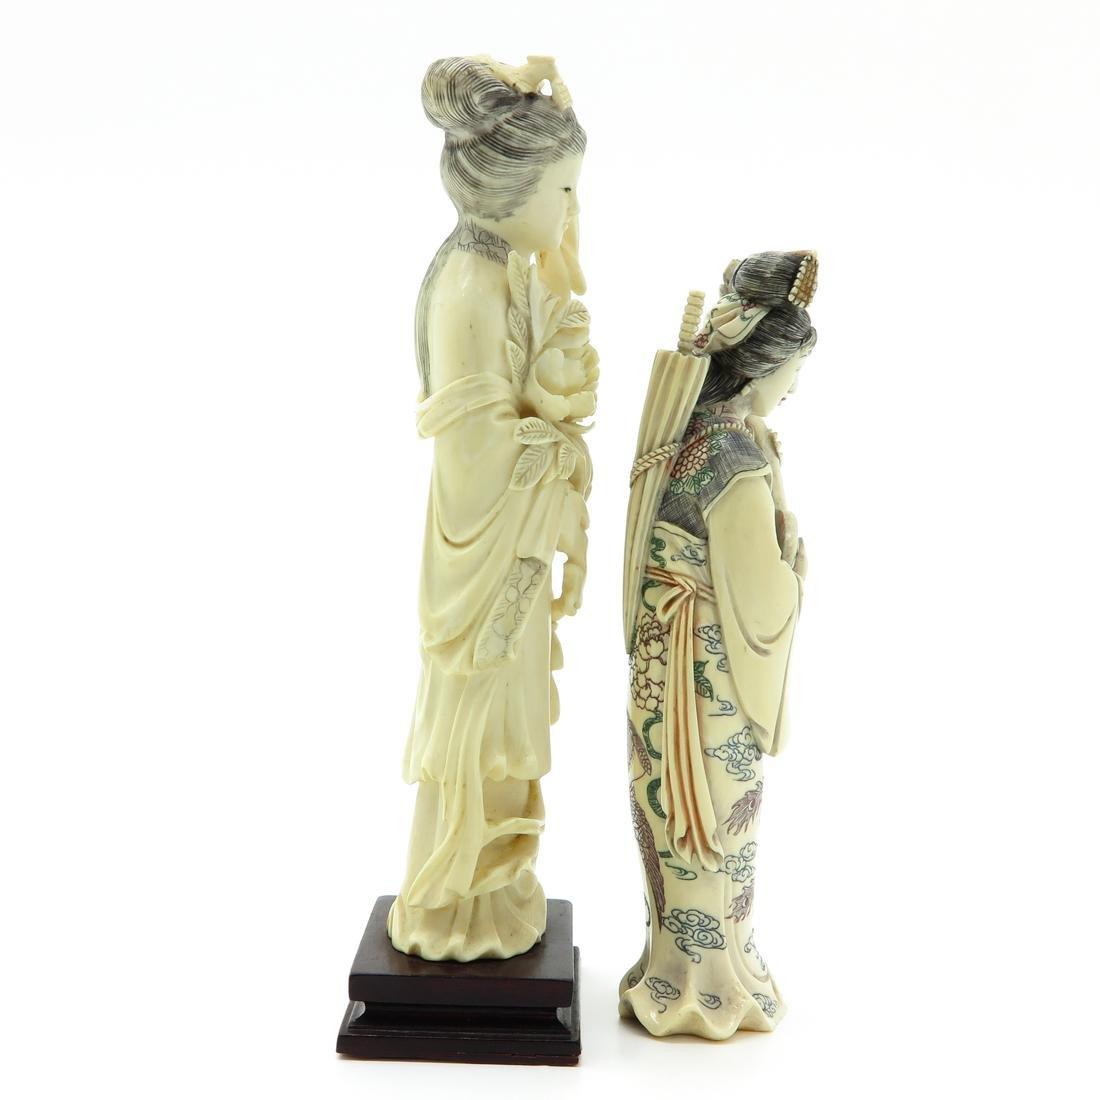 Lot of 2 Carved Sculptures - 4